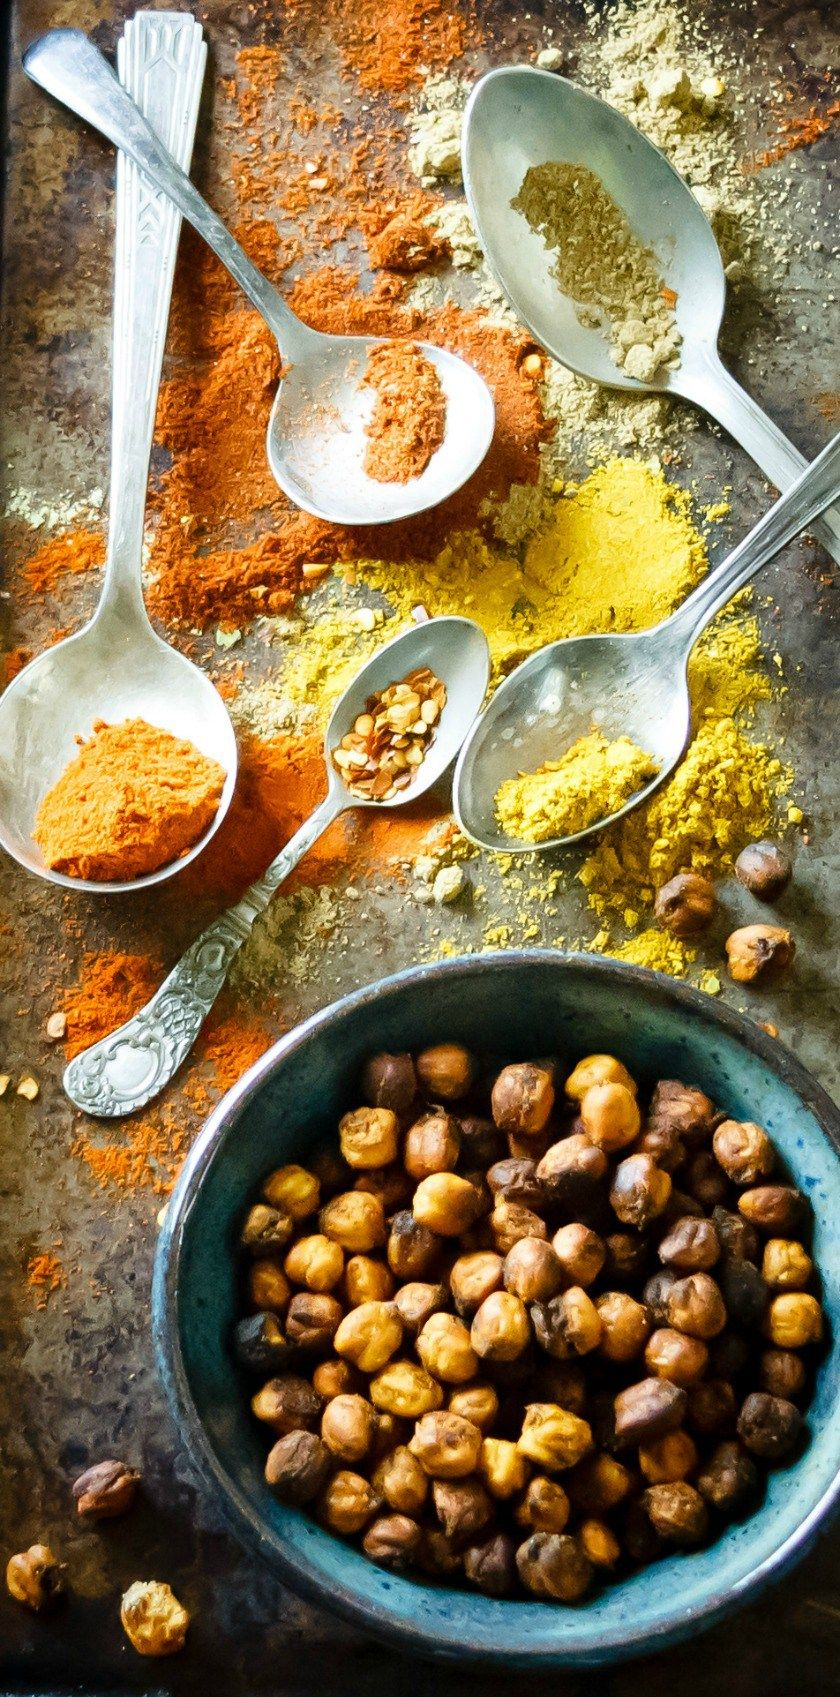 OvenCrispy Indian Spiced Chickpeas Recipe